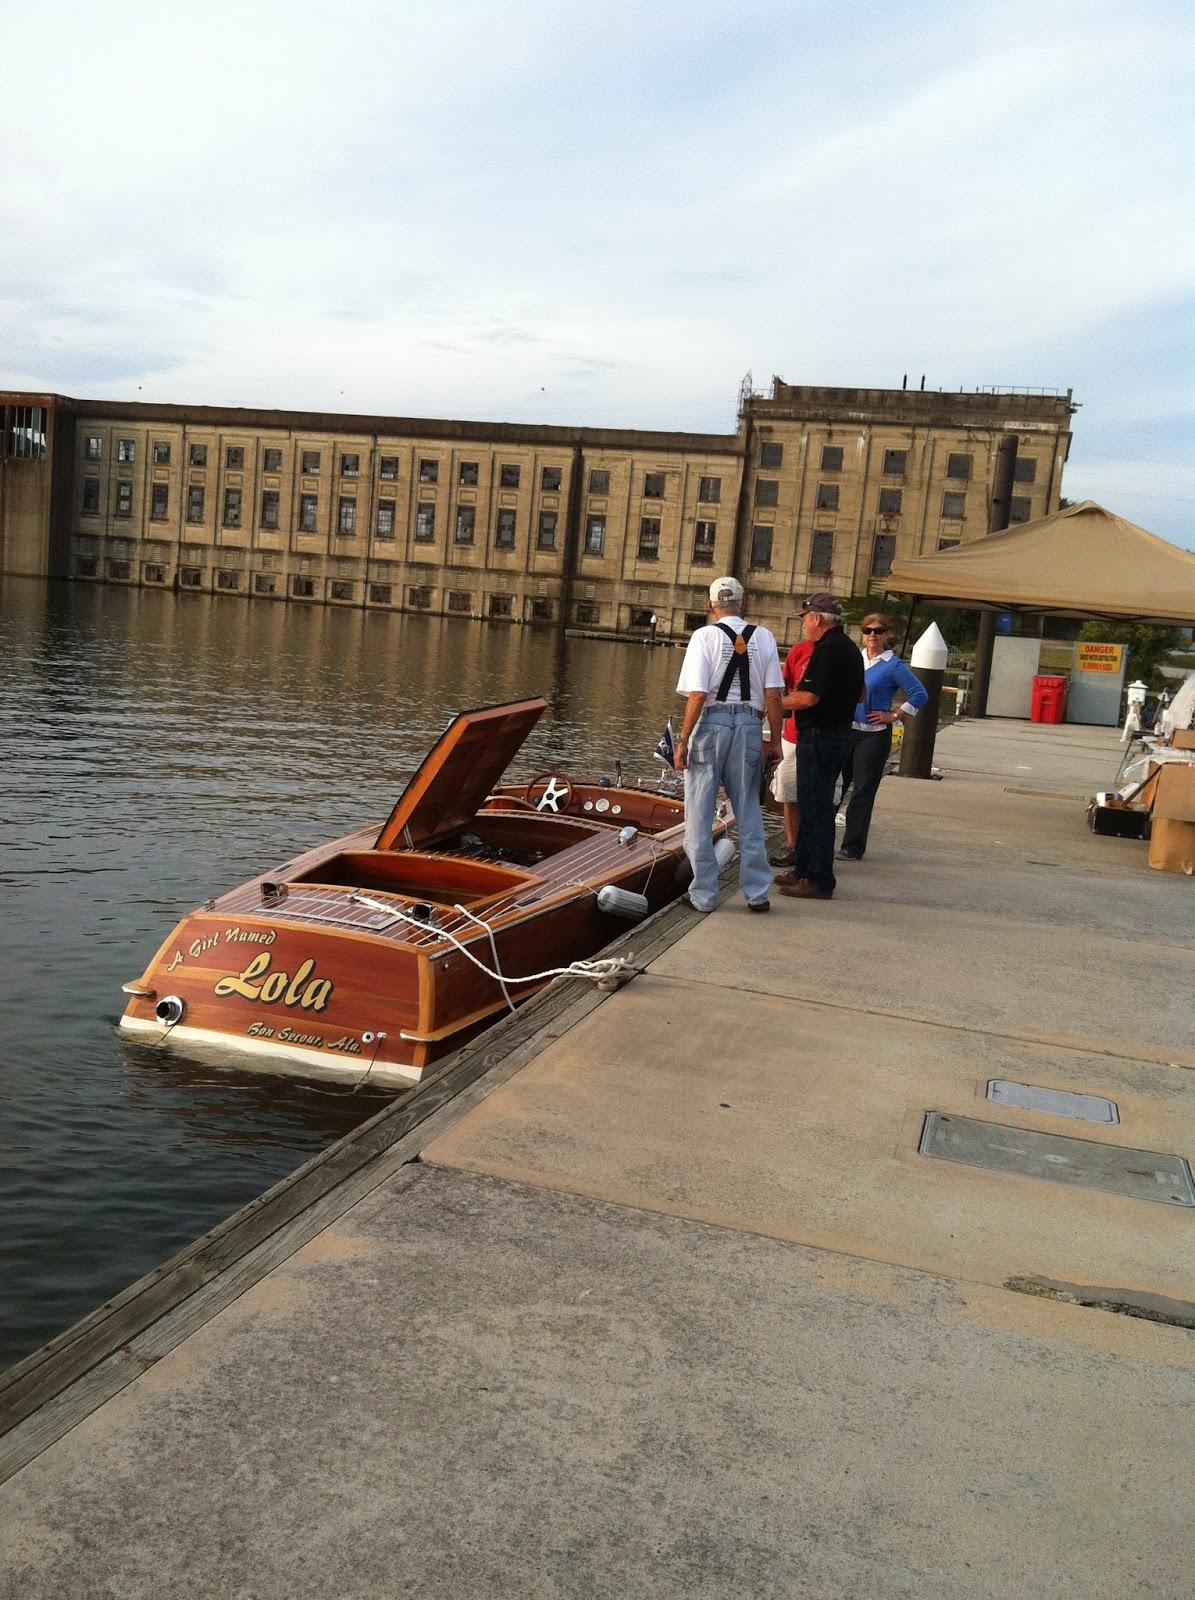 Pappy S Malahini Boat Build